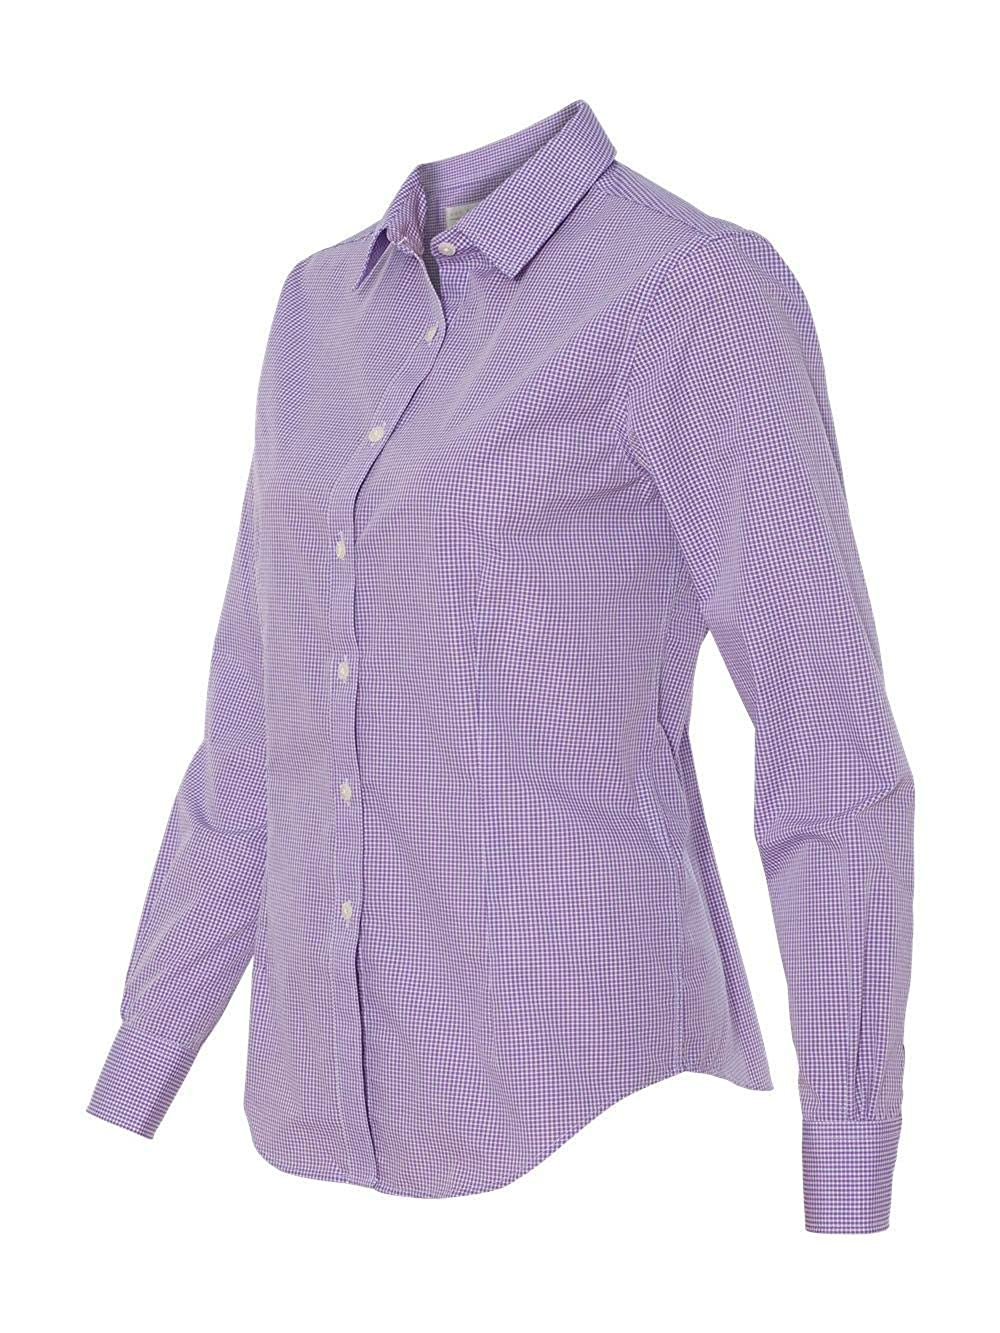 cf3b66e06cc21b Van Heusen V0226 Ladies Long Sleeve Yarn Dyed Gingham Check: Amazon.co.uk:  Kitchen & Home